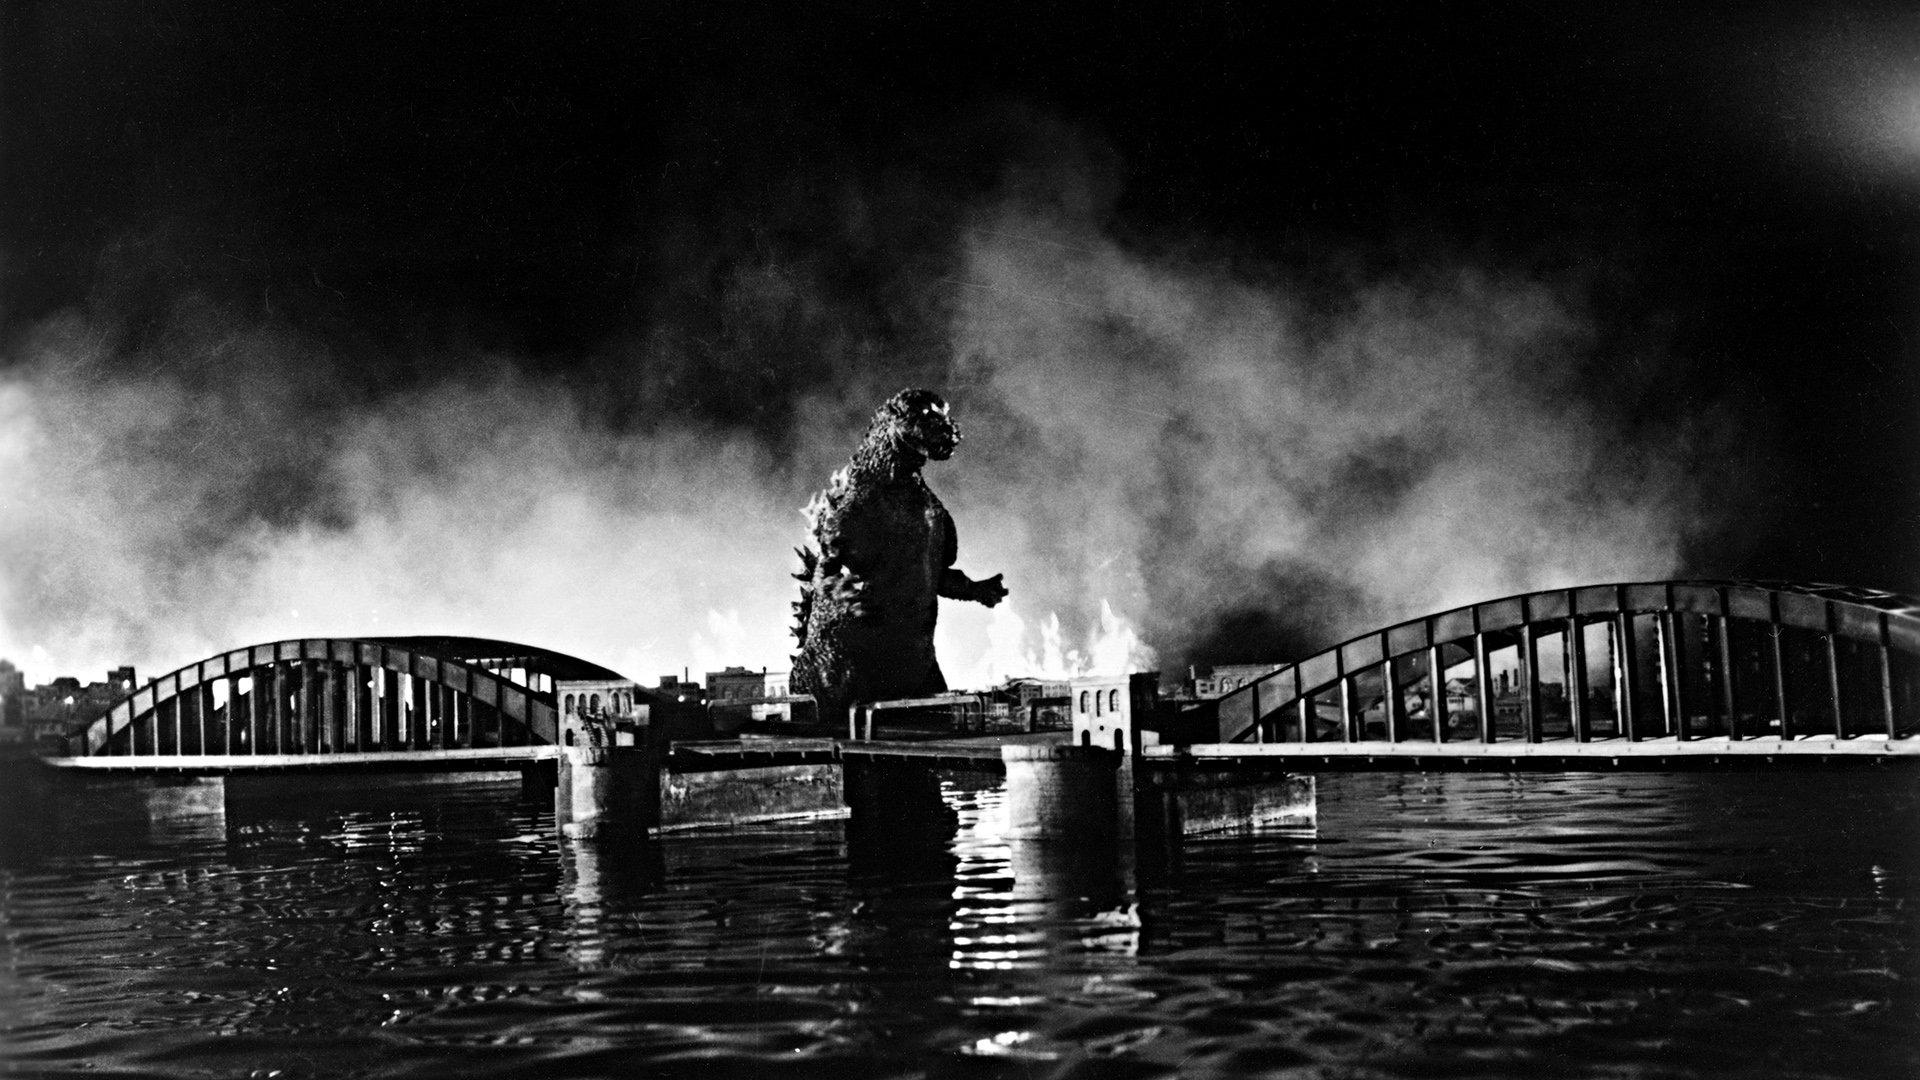 2 Godzilla (1954) Fondos de pantalla HD | Fondos de Escritorio - Wallpaper Abyss